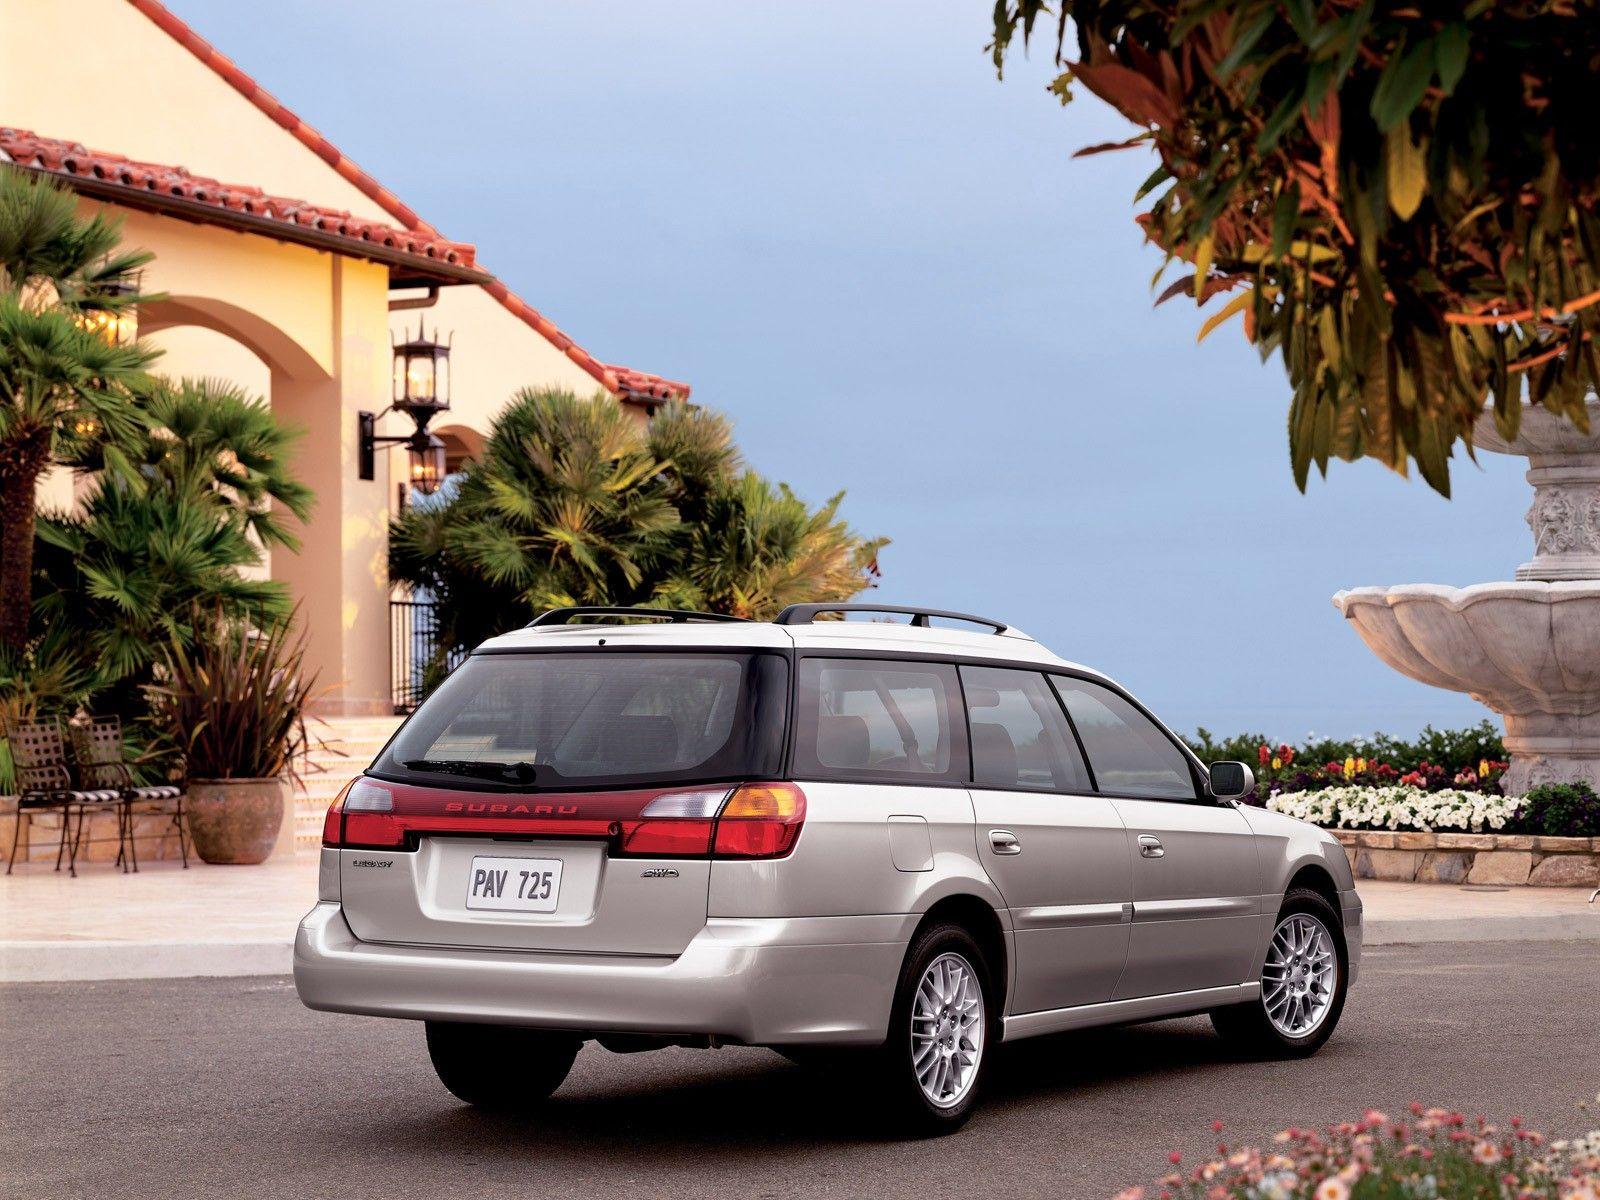 subaru legacy 2 5i station wagon north america be bh 1998 2003 in 2020 subaru legacy station wagon subaru pinterest